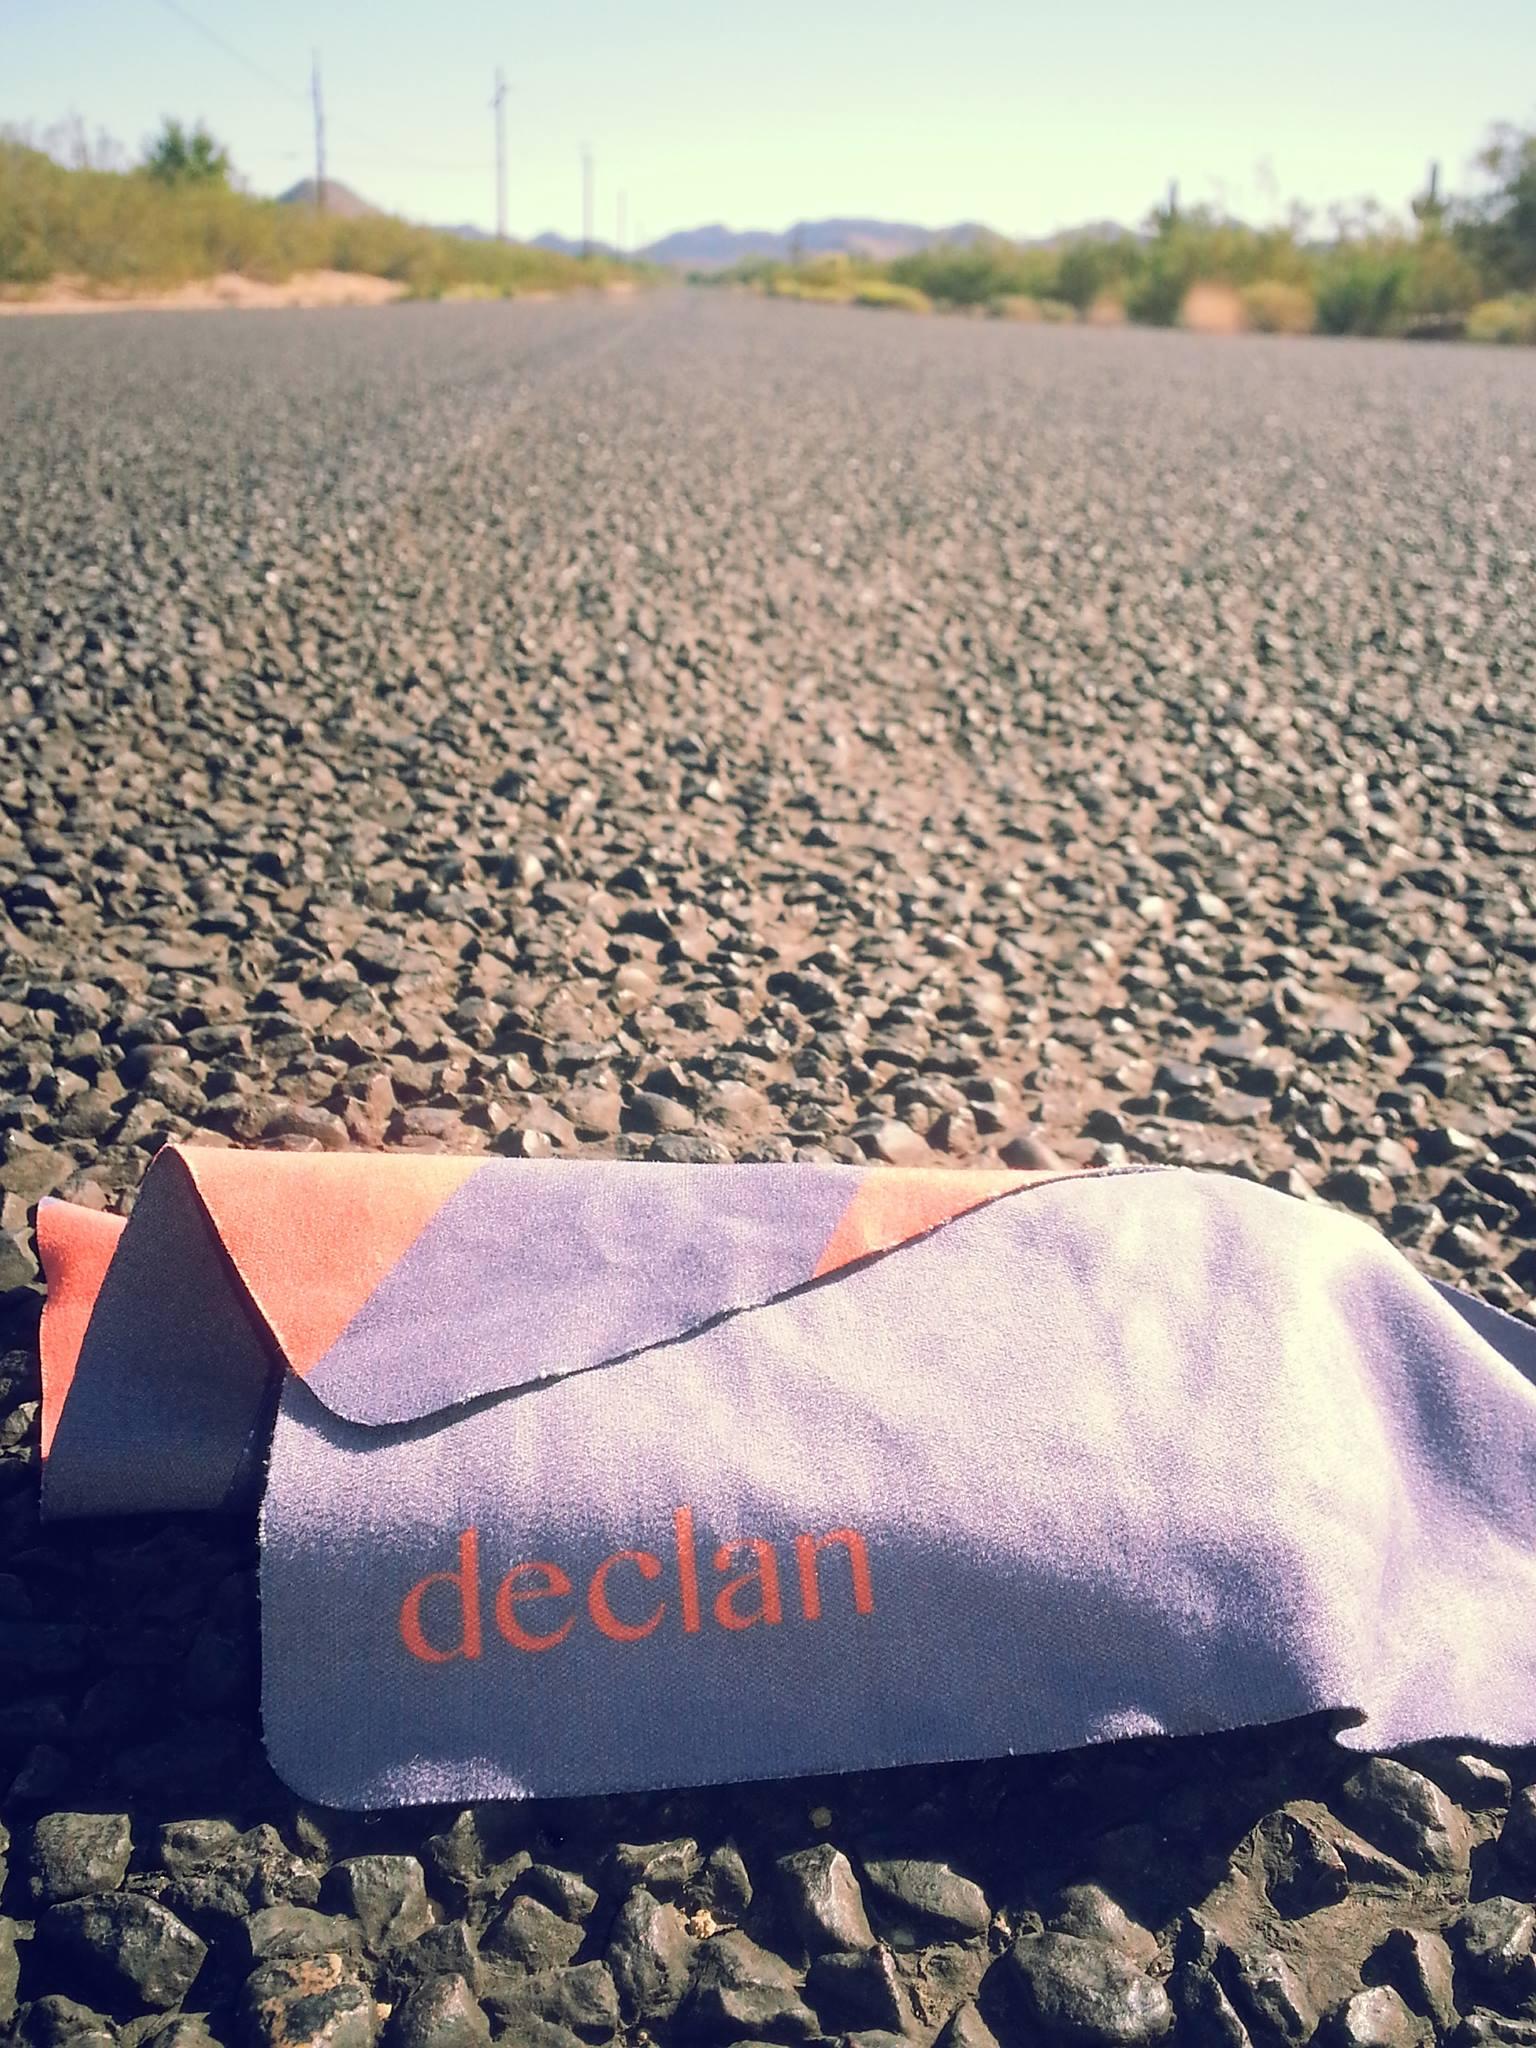 declan3